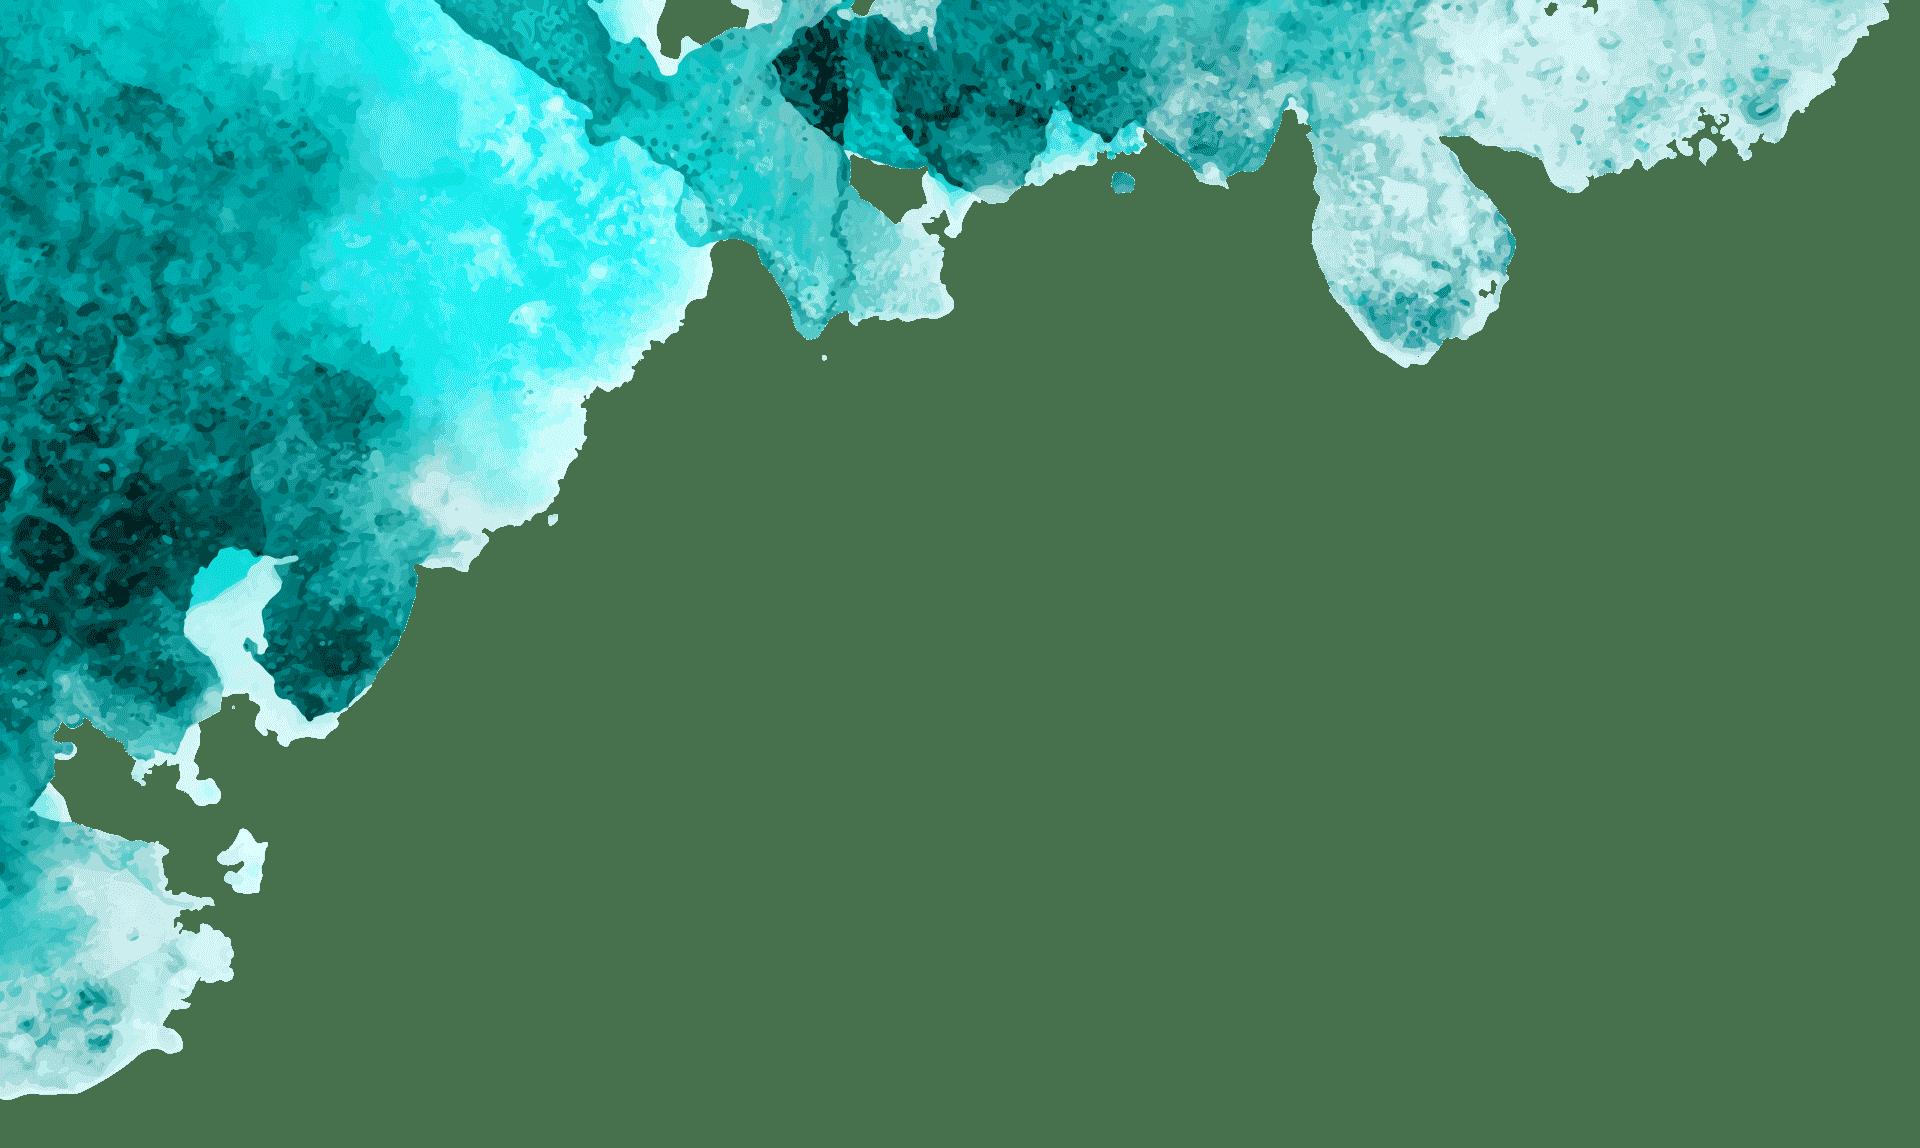 Watercolour-corners.png